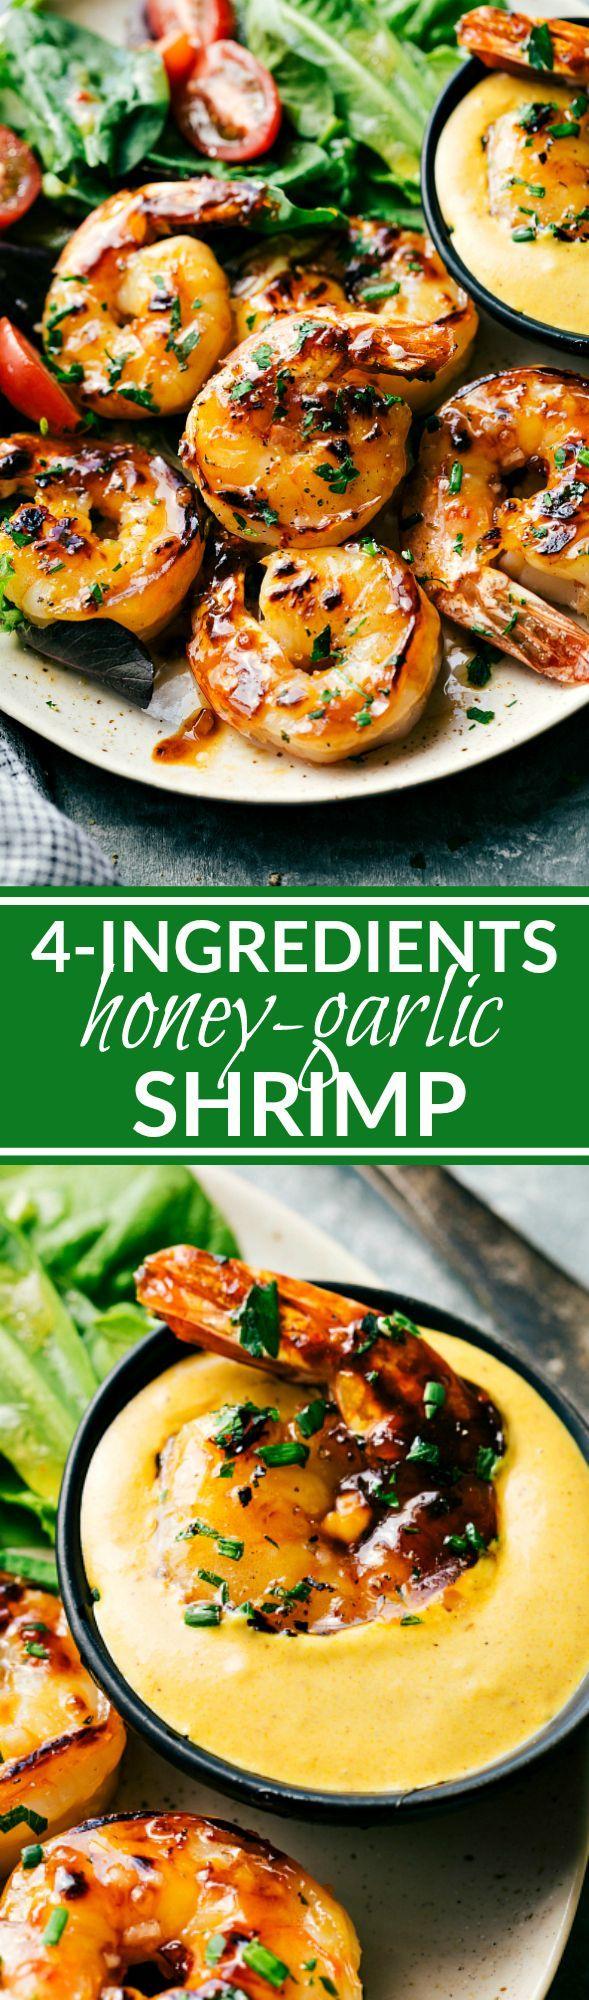 SWEET HONEY GARLIC SHRIMP! The easiest shrimp dish! Only three ingredients…